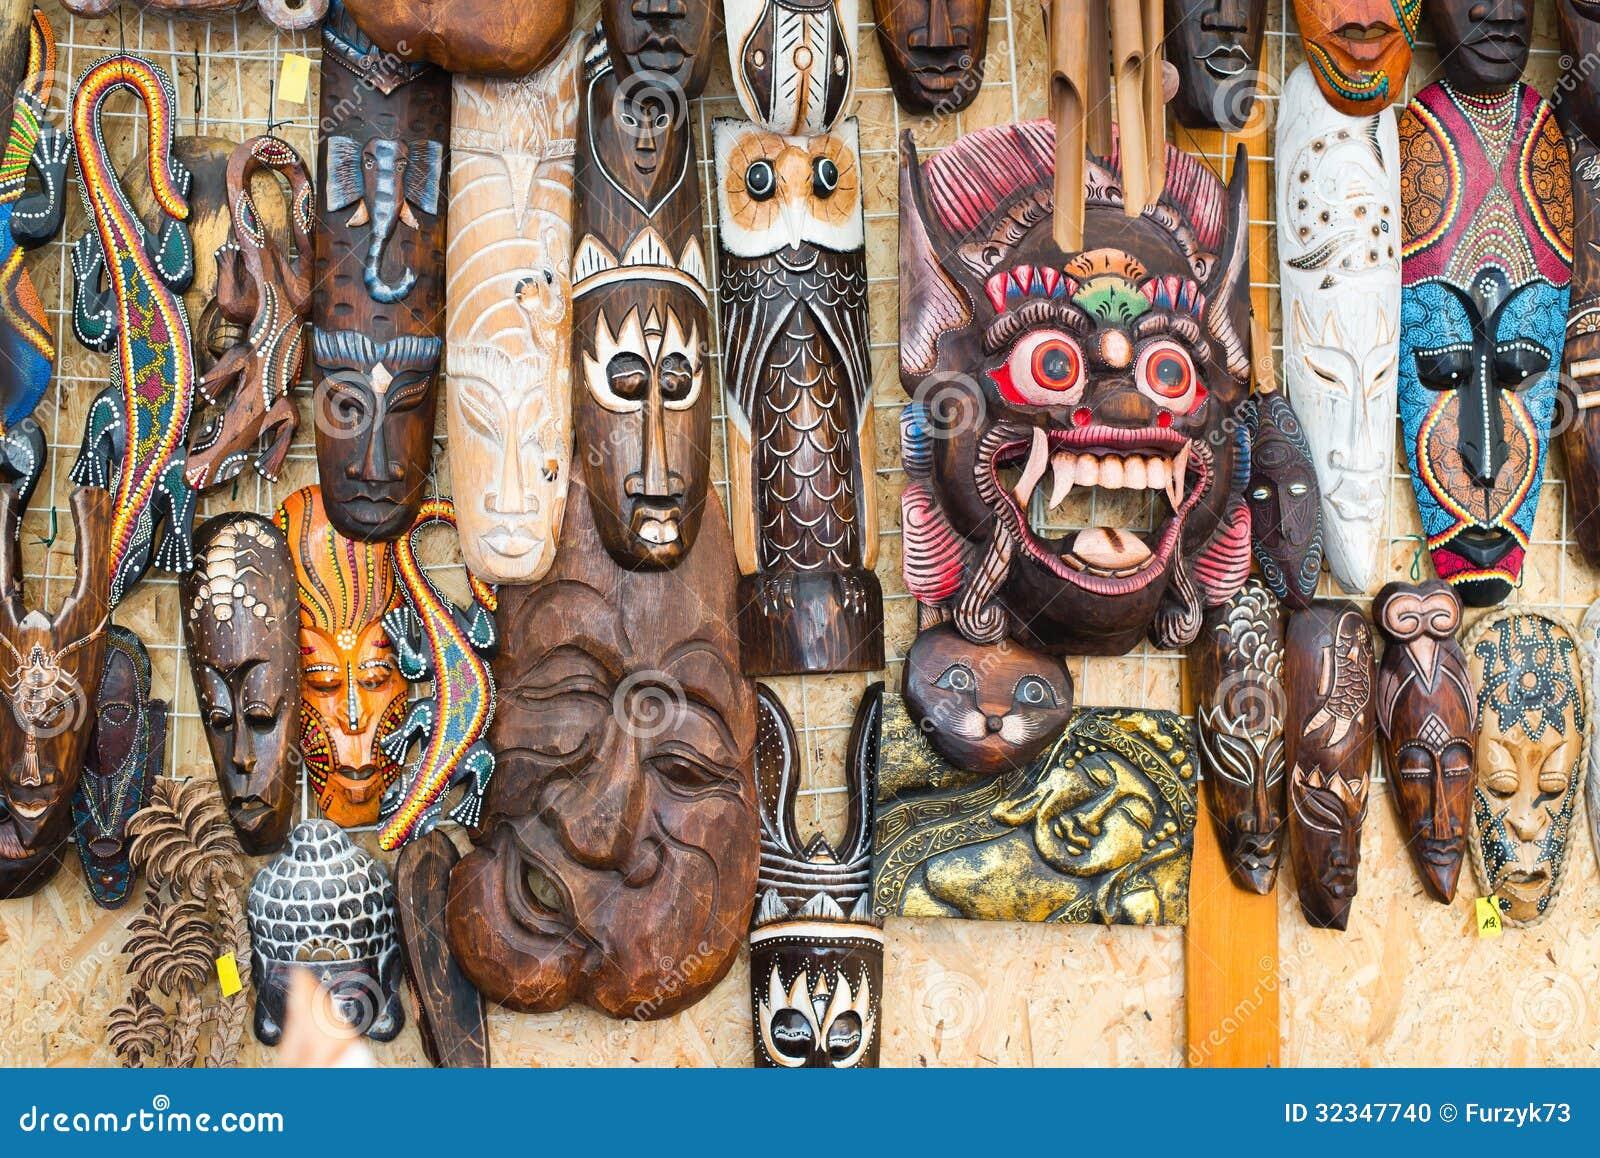 afrikanische masken stockfoto bild 32347740. Black Bedroom Furniture Sets. Home Design Ideas